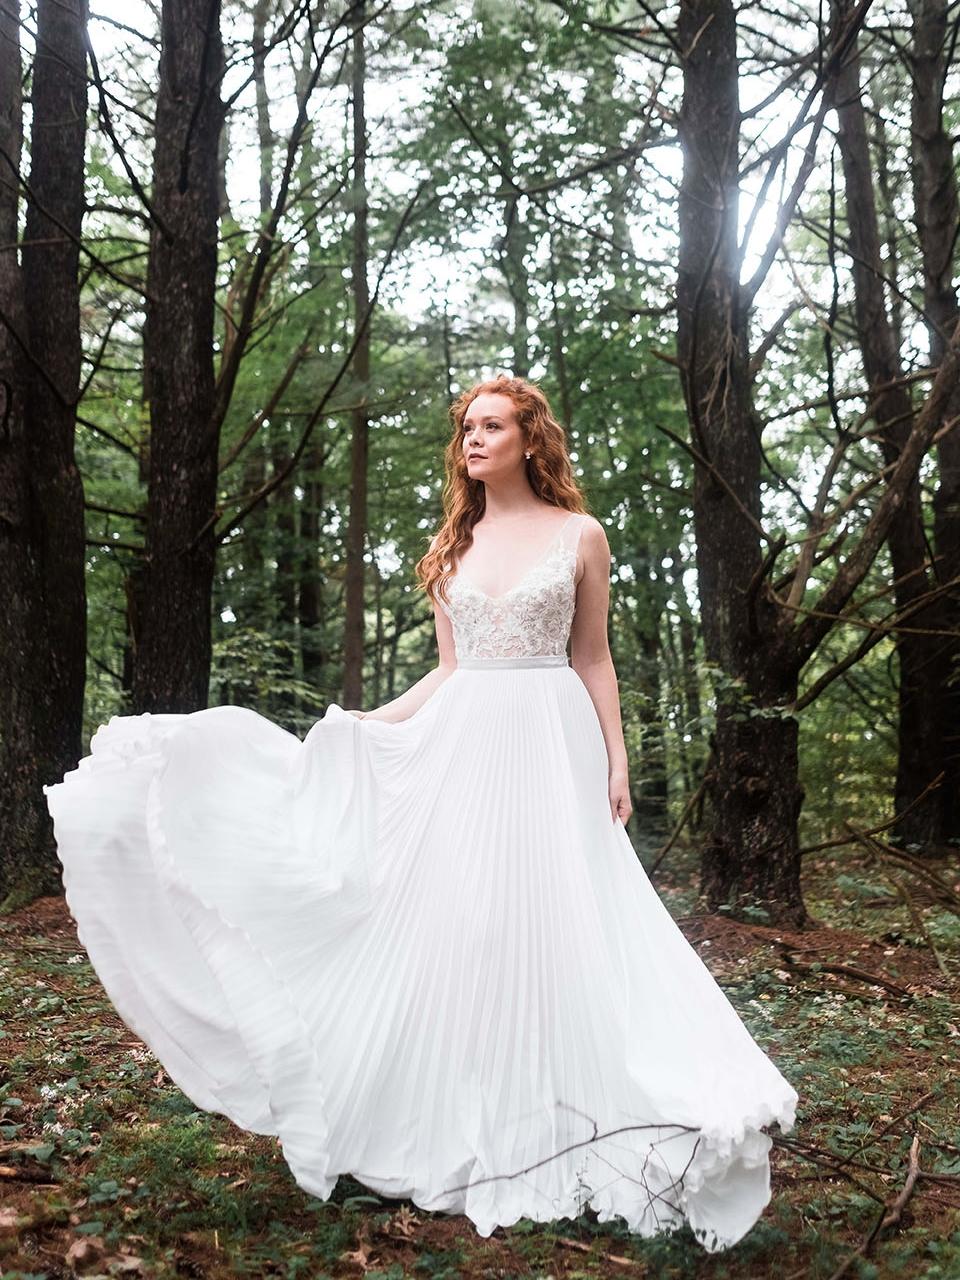 rebecca_schoneveld_quinn_gown_applique_bodice_pleated_skirt_romantic_3.jpg